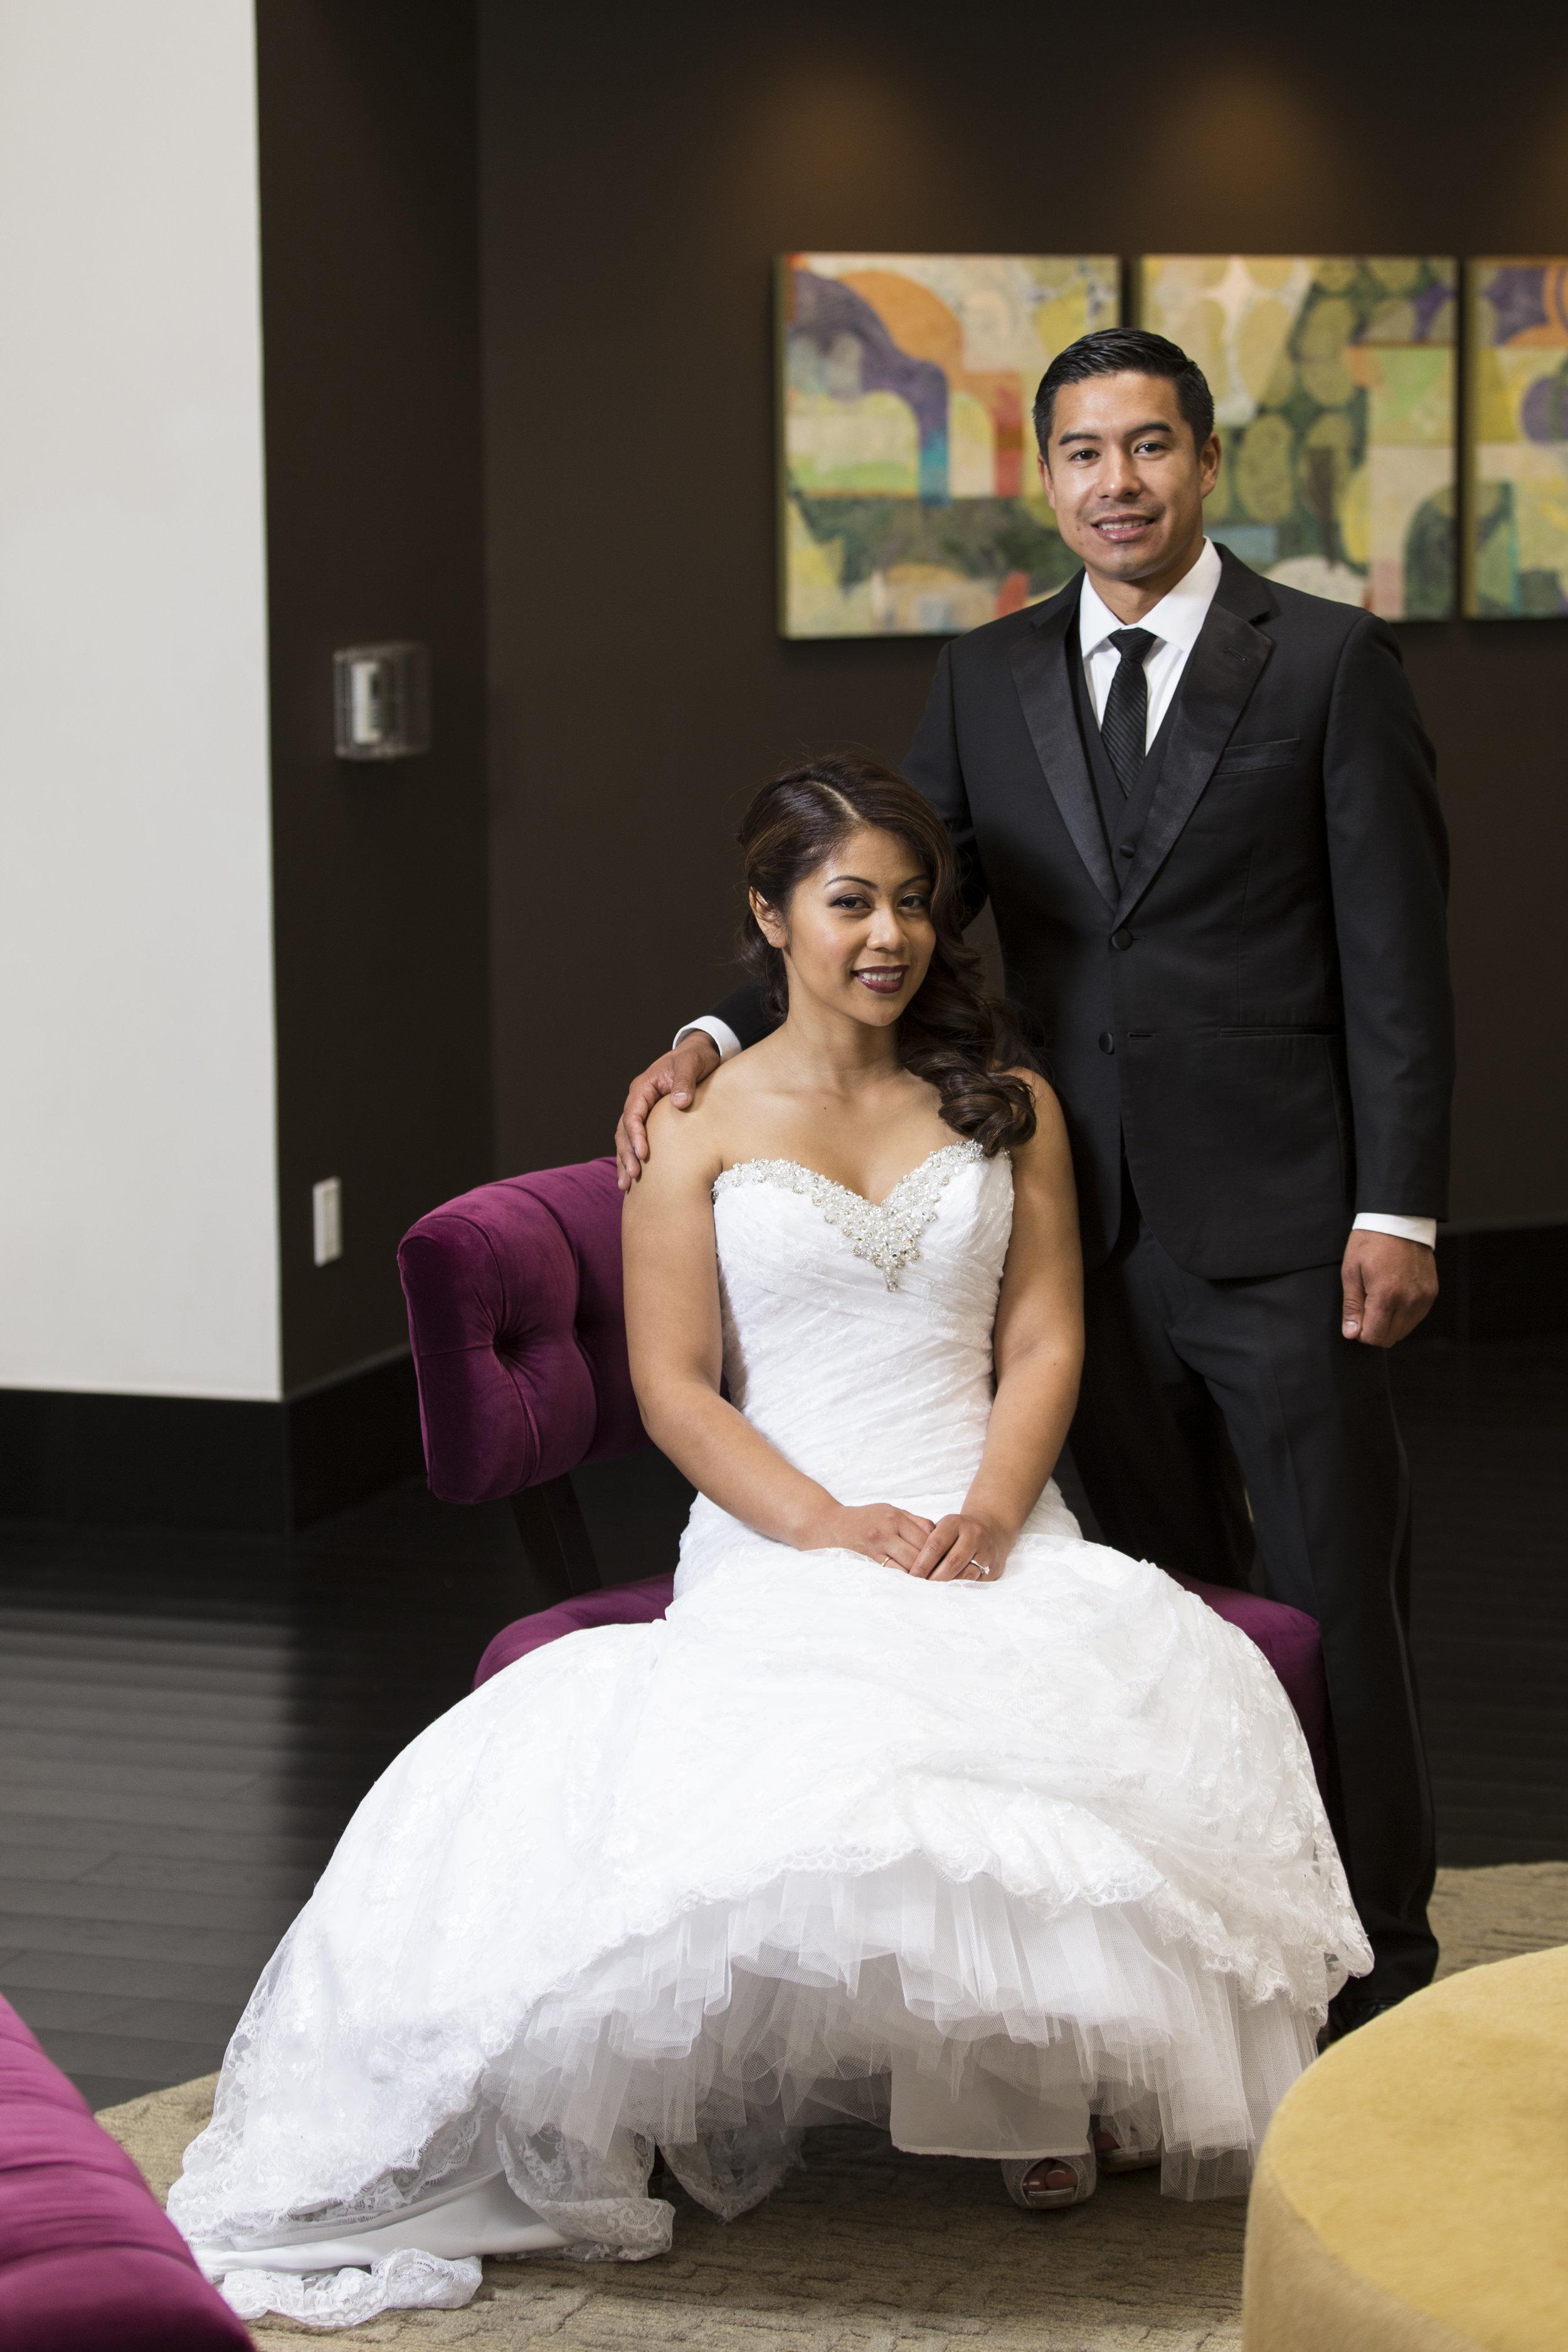 Costa Mesa Wedding Photography_Oscar&Amber-167.jpg